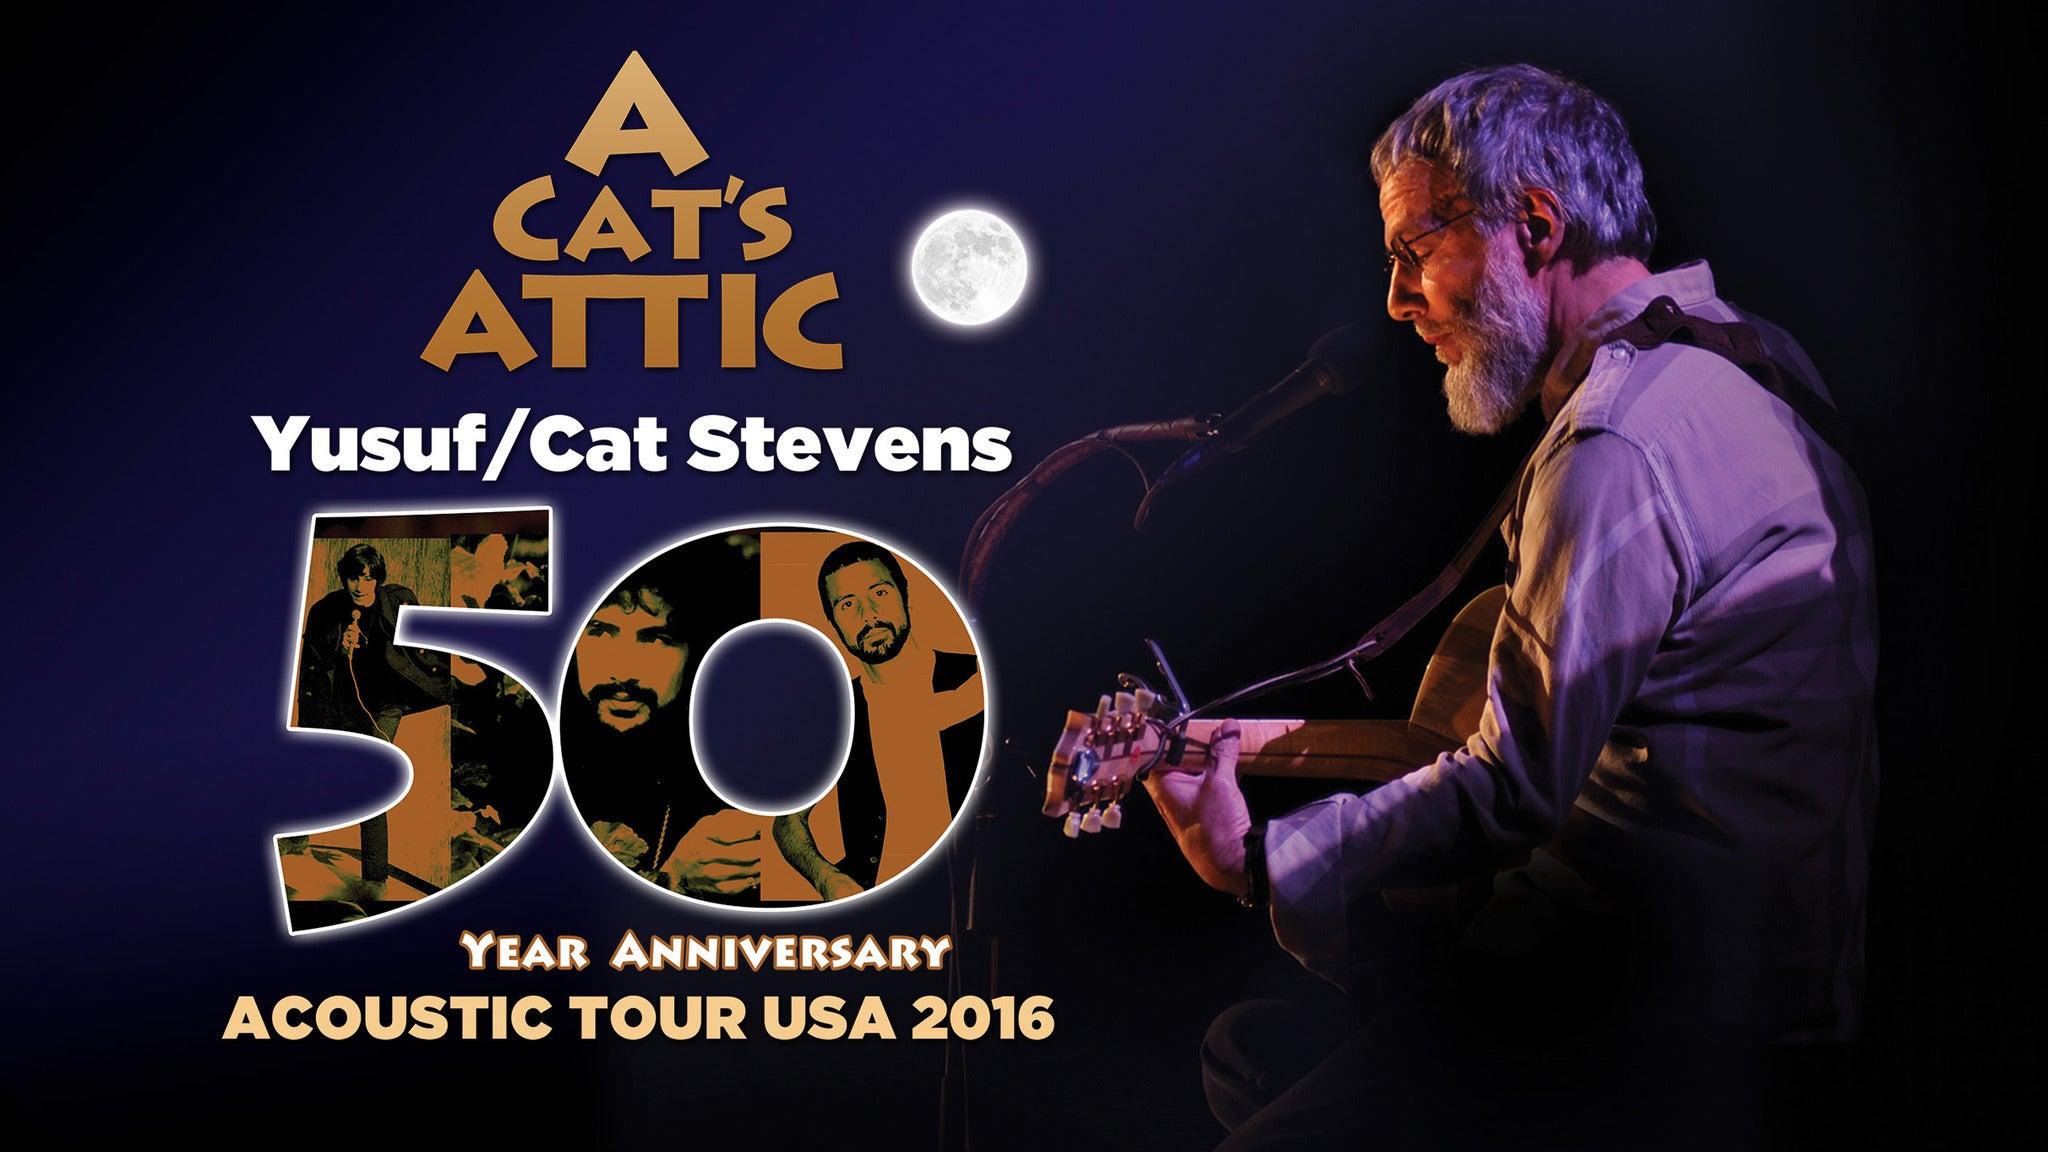 A Cat's Attic:  Yusuf / Cat Stevens